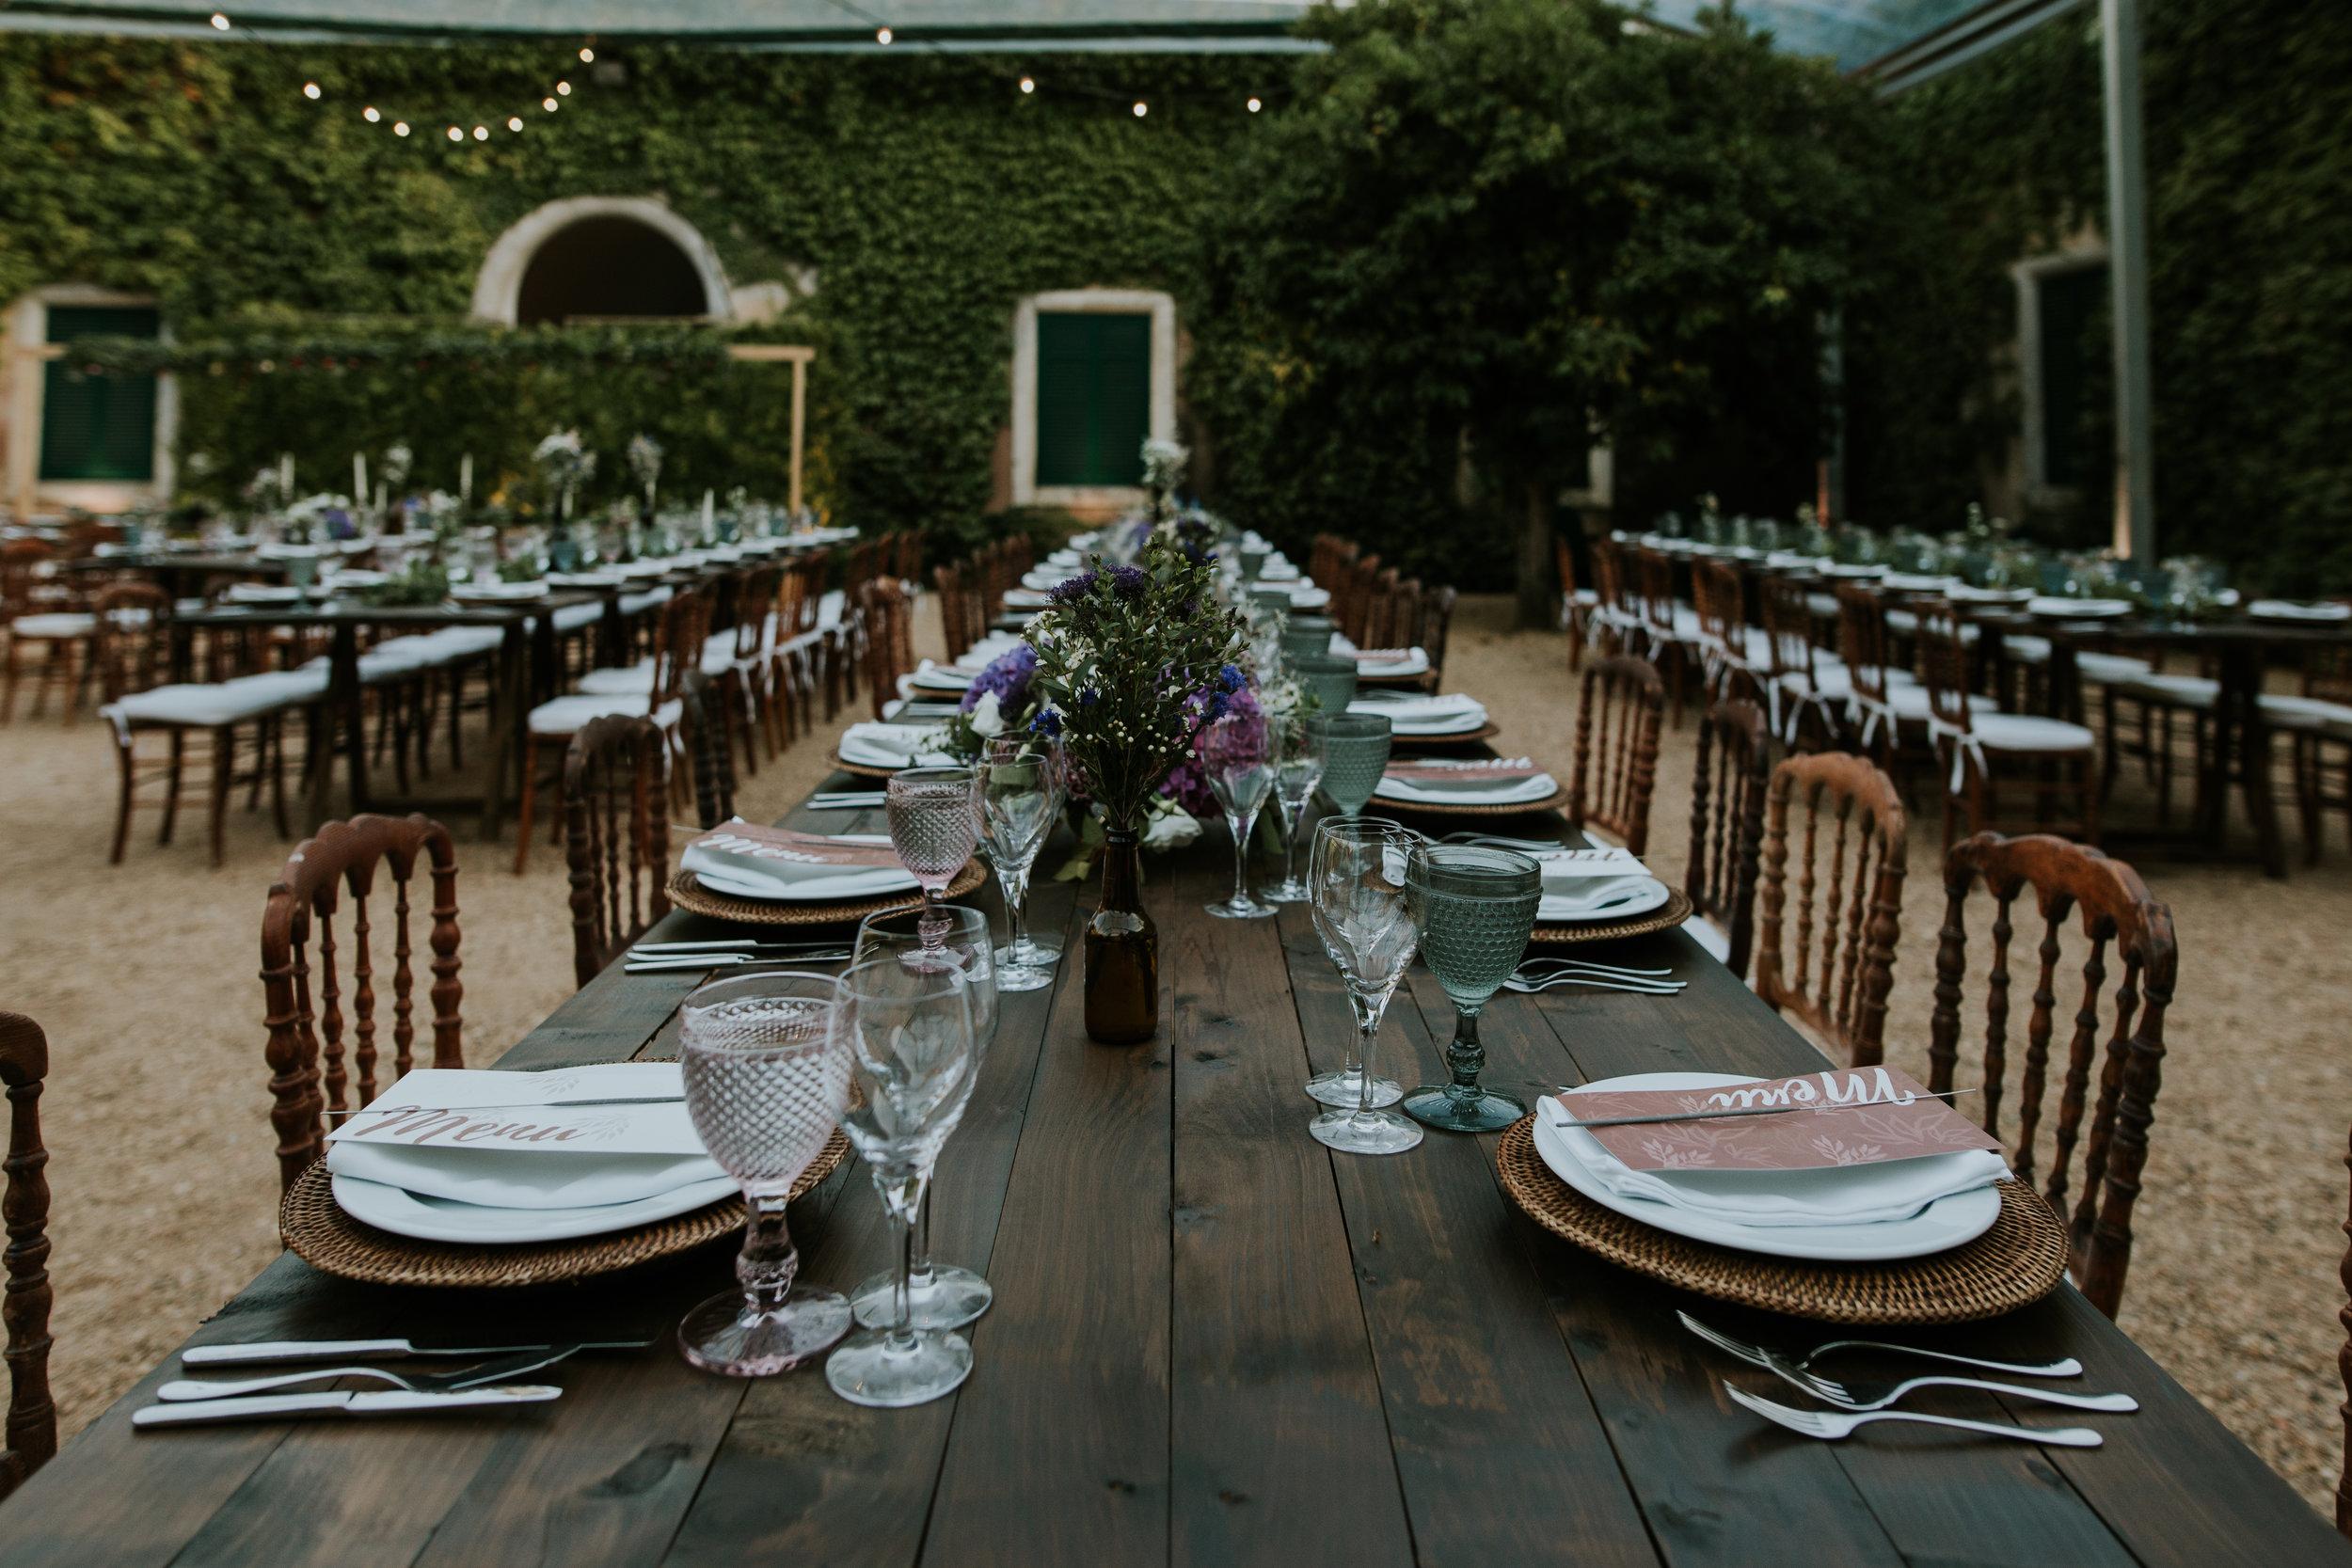 014_09 setembro 2017_ wedding_in_azeitao_portugal.jpg